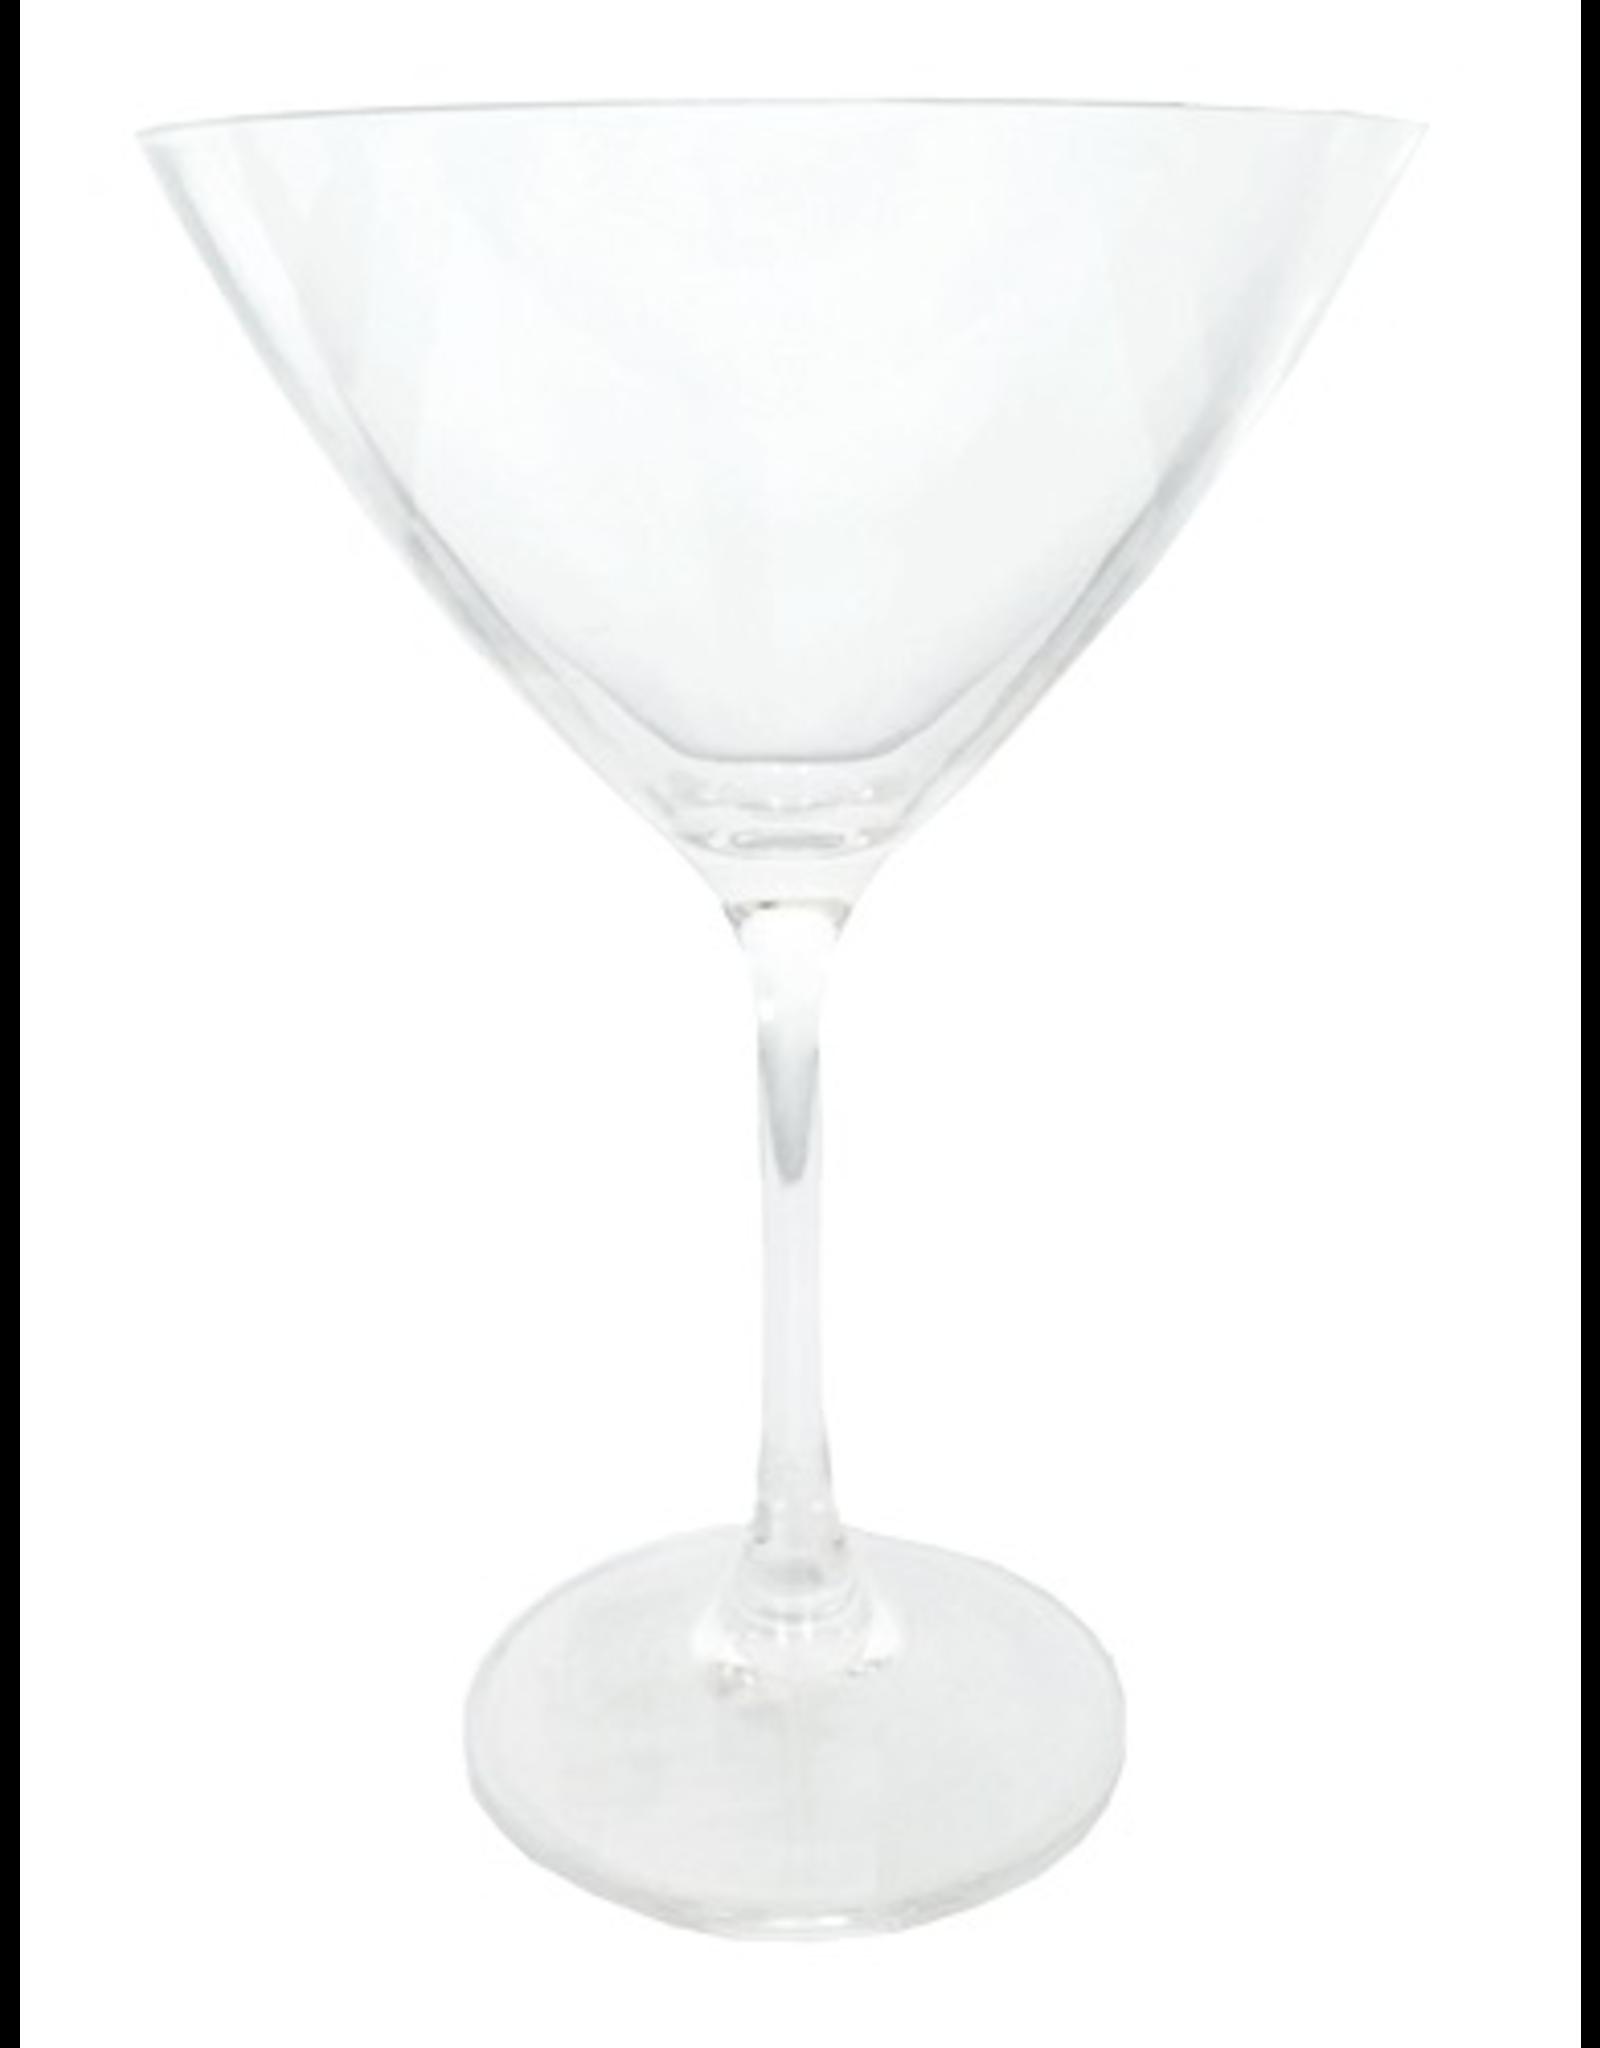 Caspari Acrylic Martini Glass 10oz Shatter Resistant BPA Free